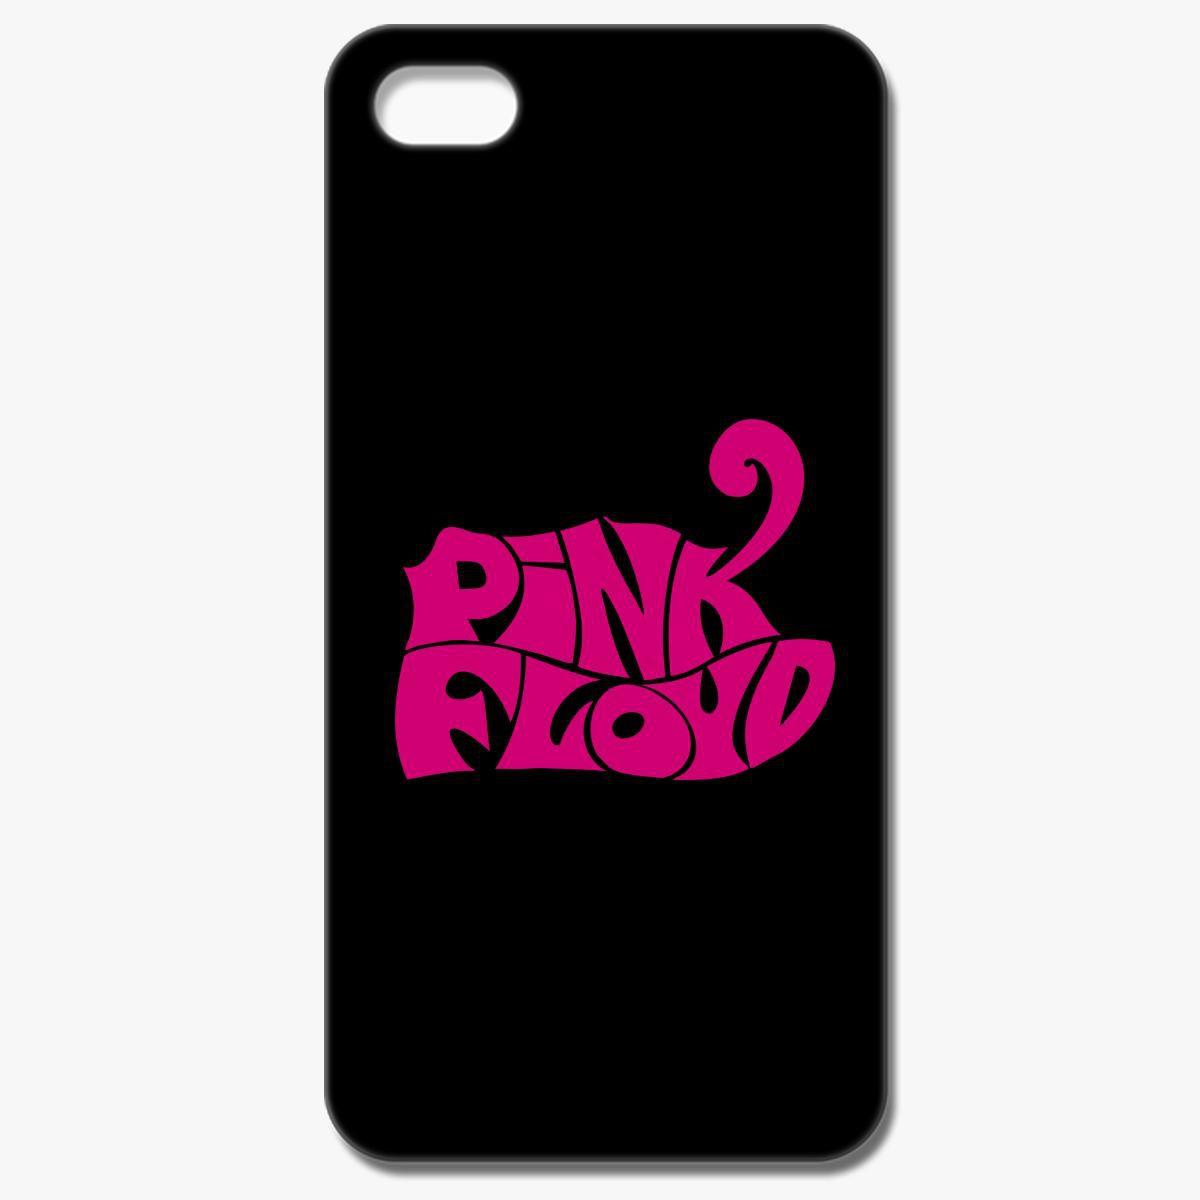 Pink Floyd iPhone X - Customon - photo#38